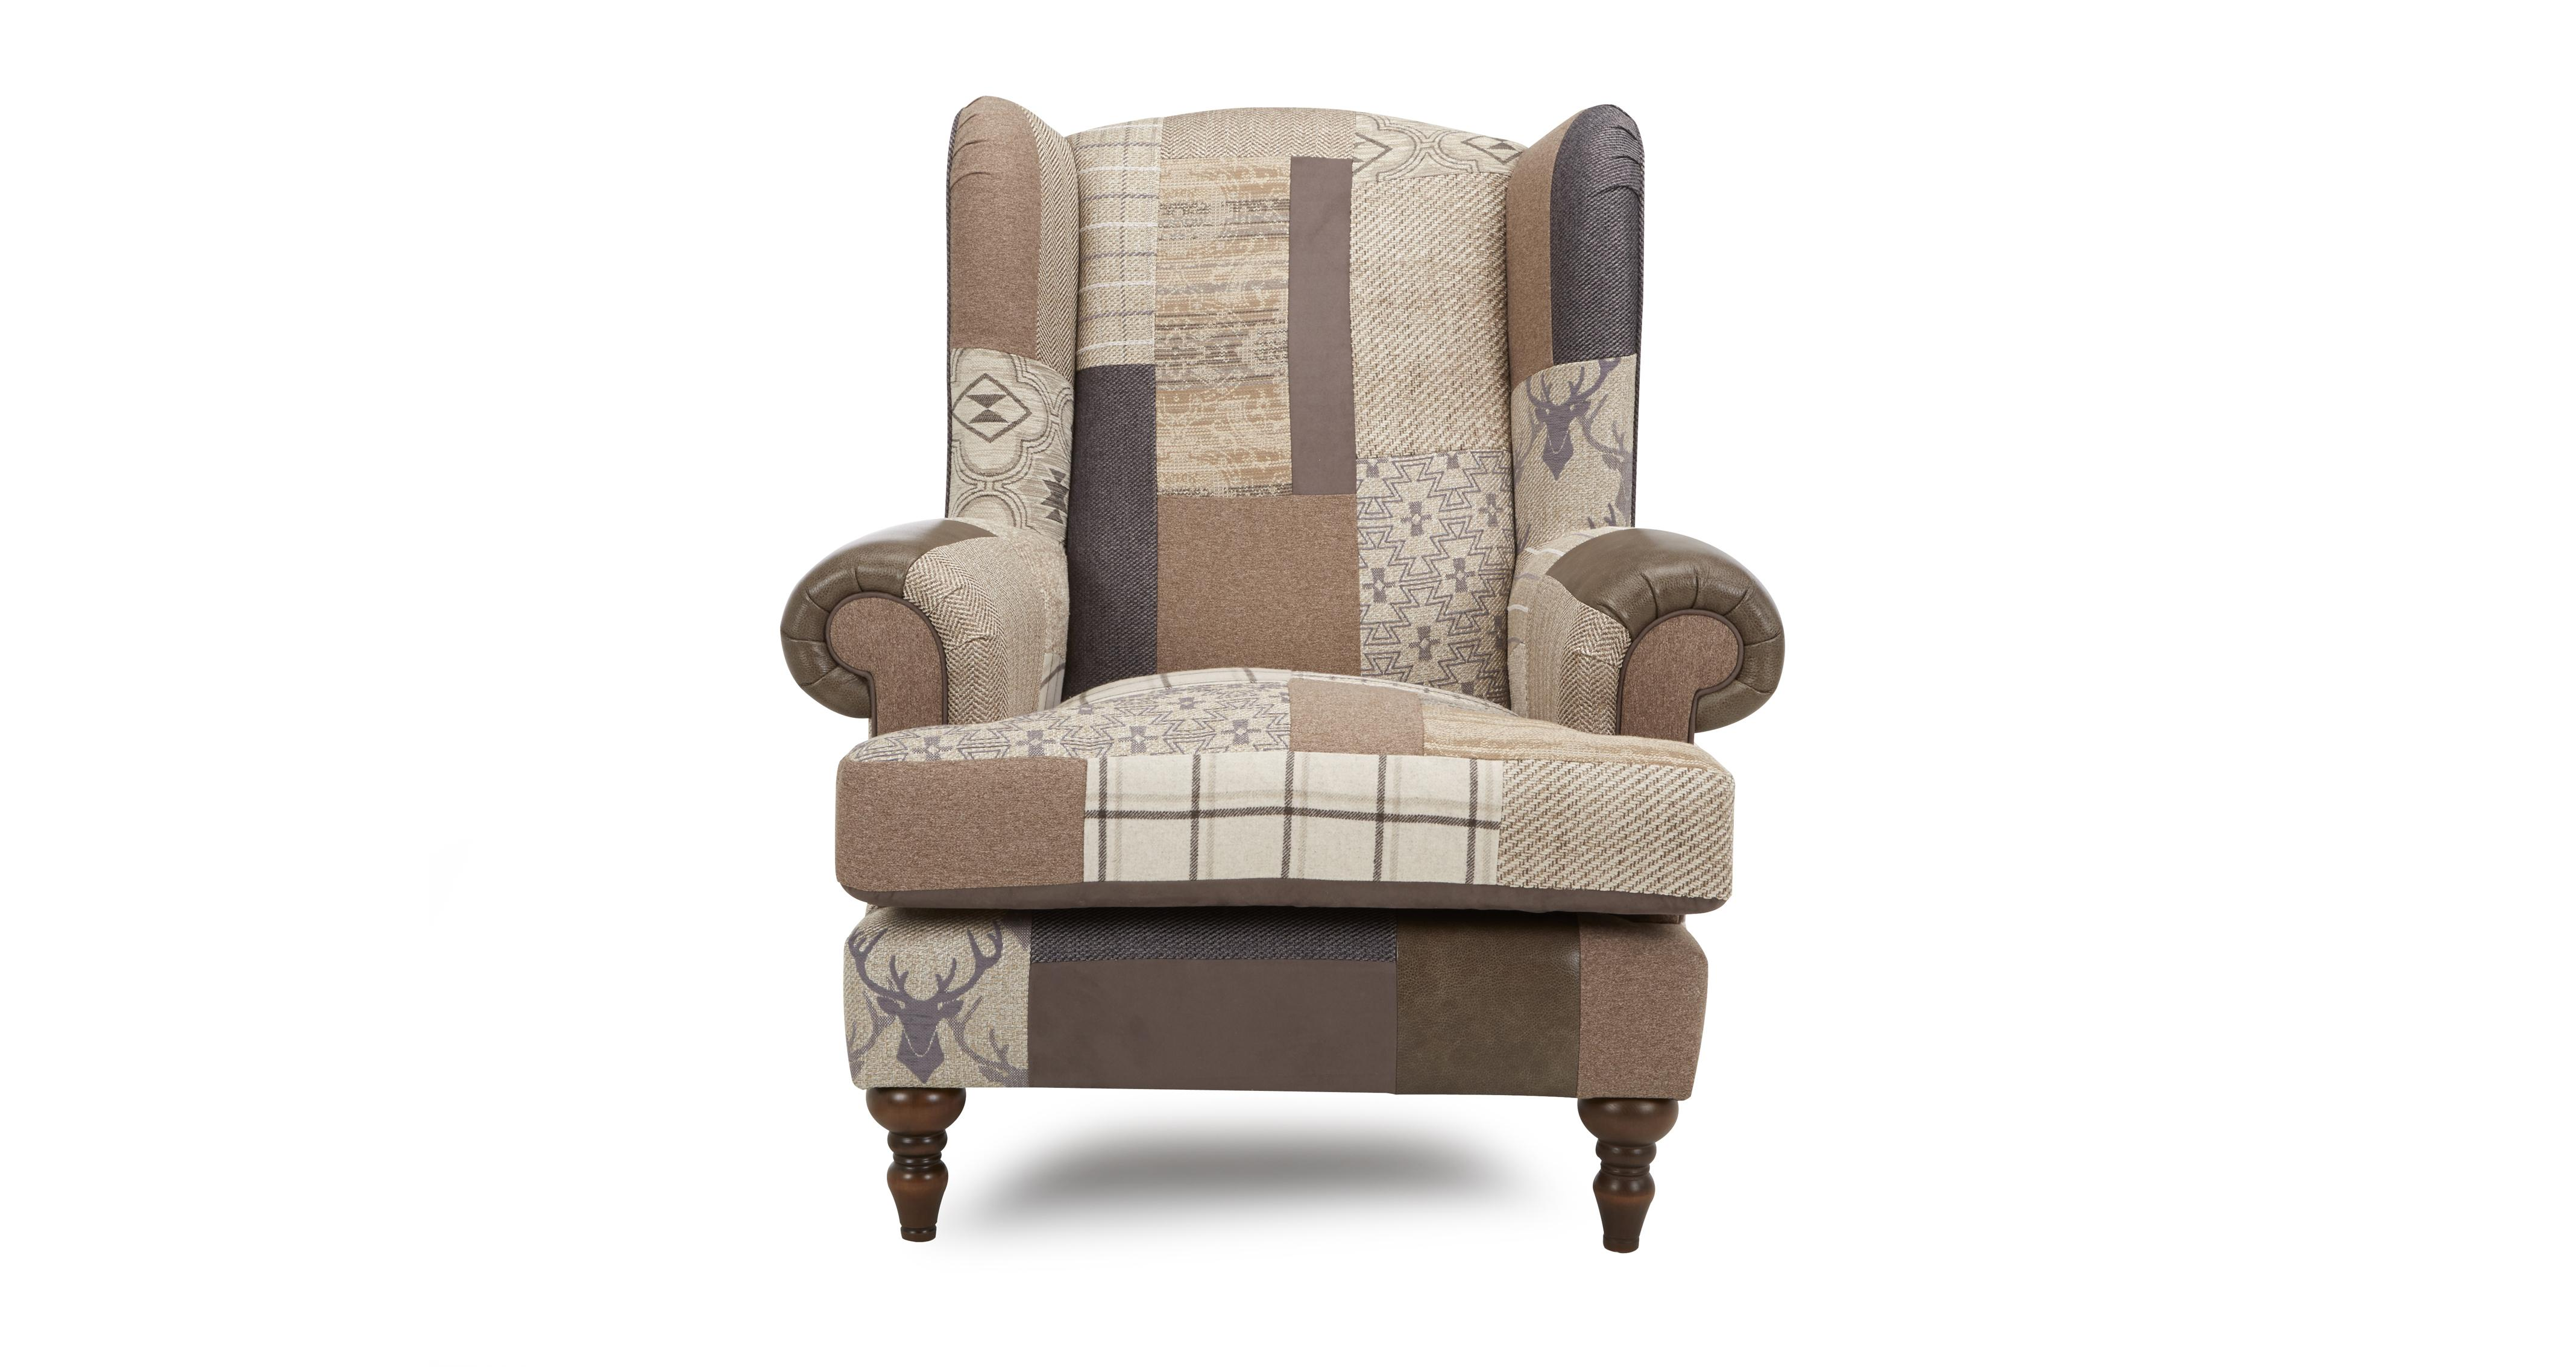 Dfs Sofa Fabric Samples picture on fabric patches for furniture with Dfs Sofa Fabric Samples, sofa 4396e9d2f0b4d940d78172f75d24d8e4